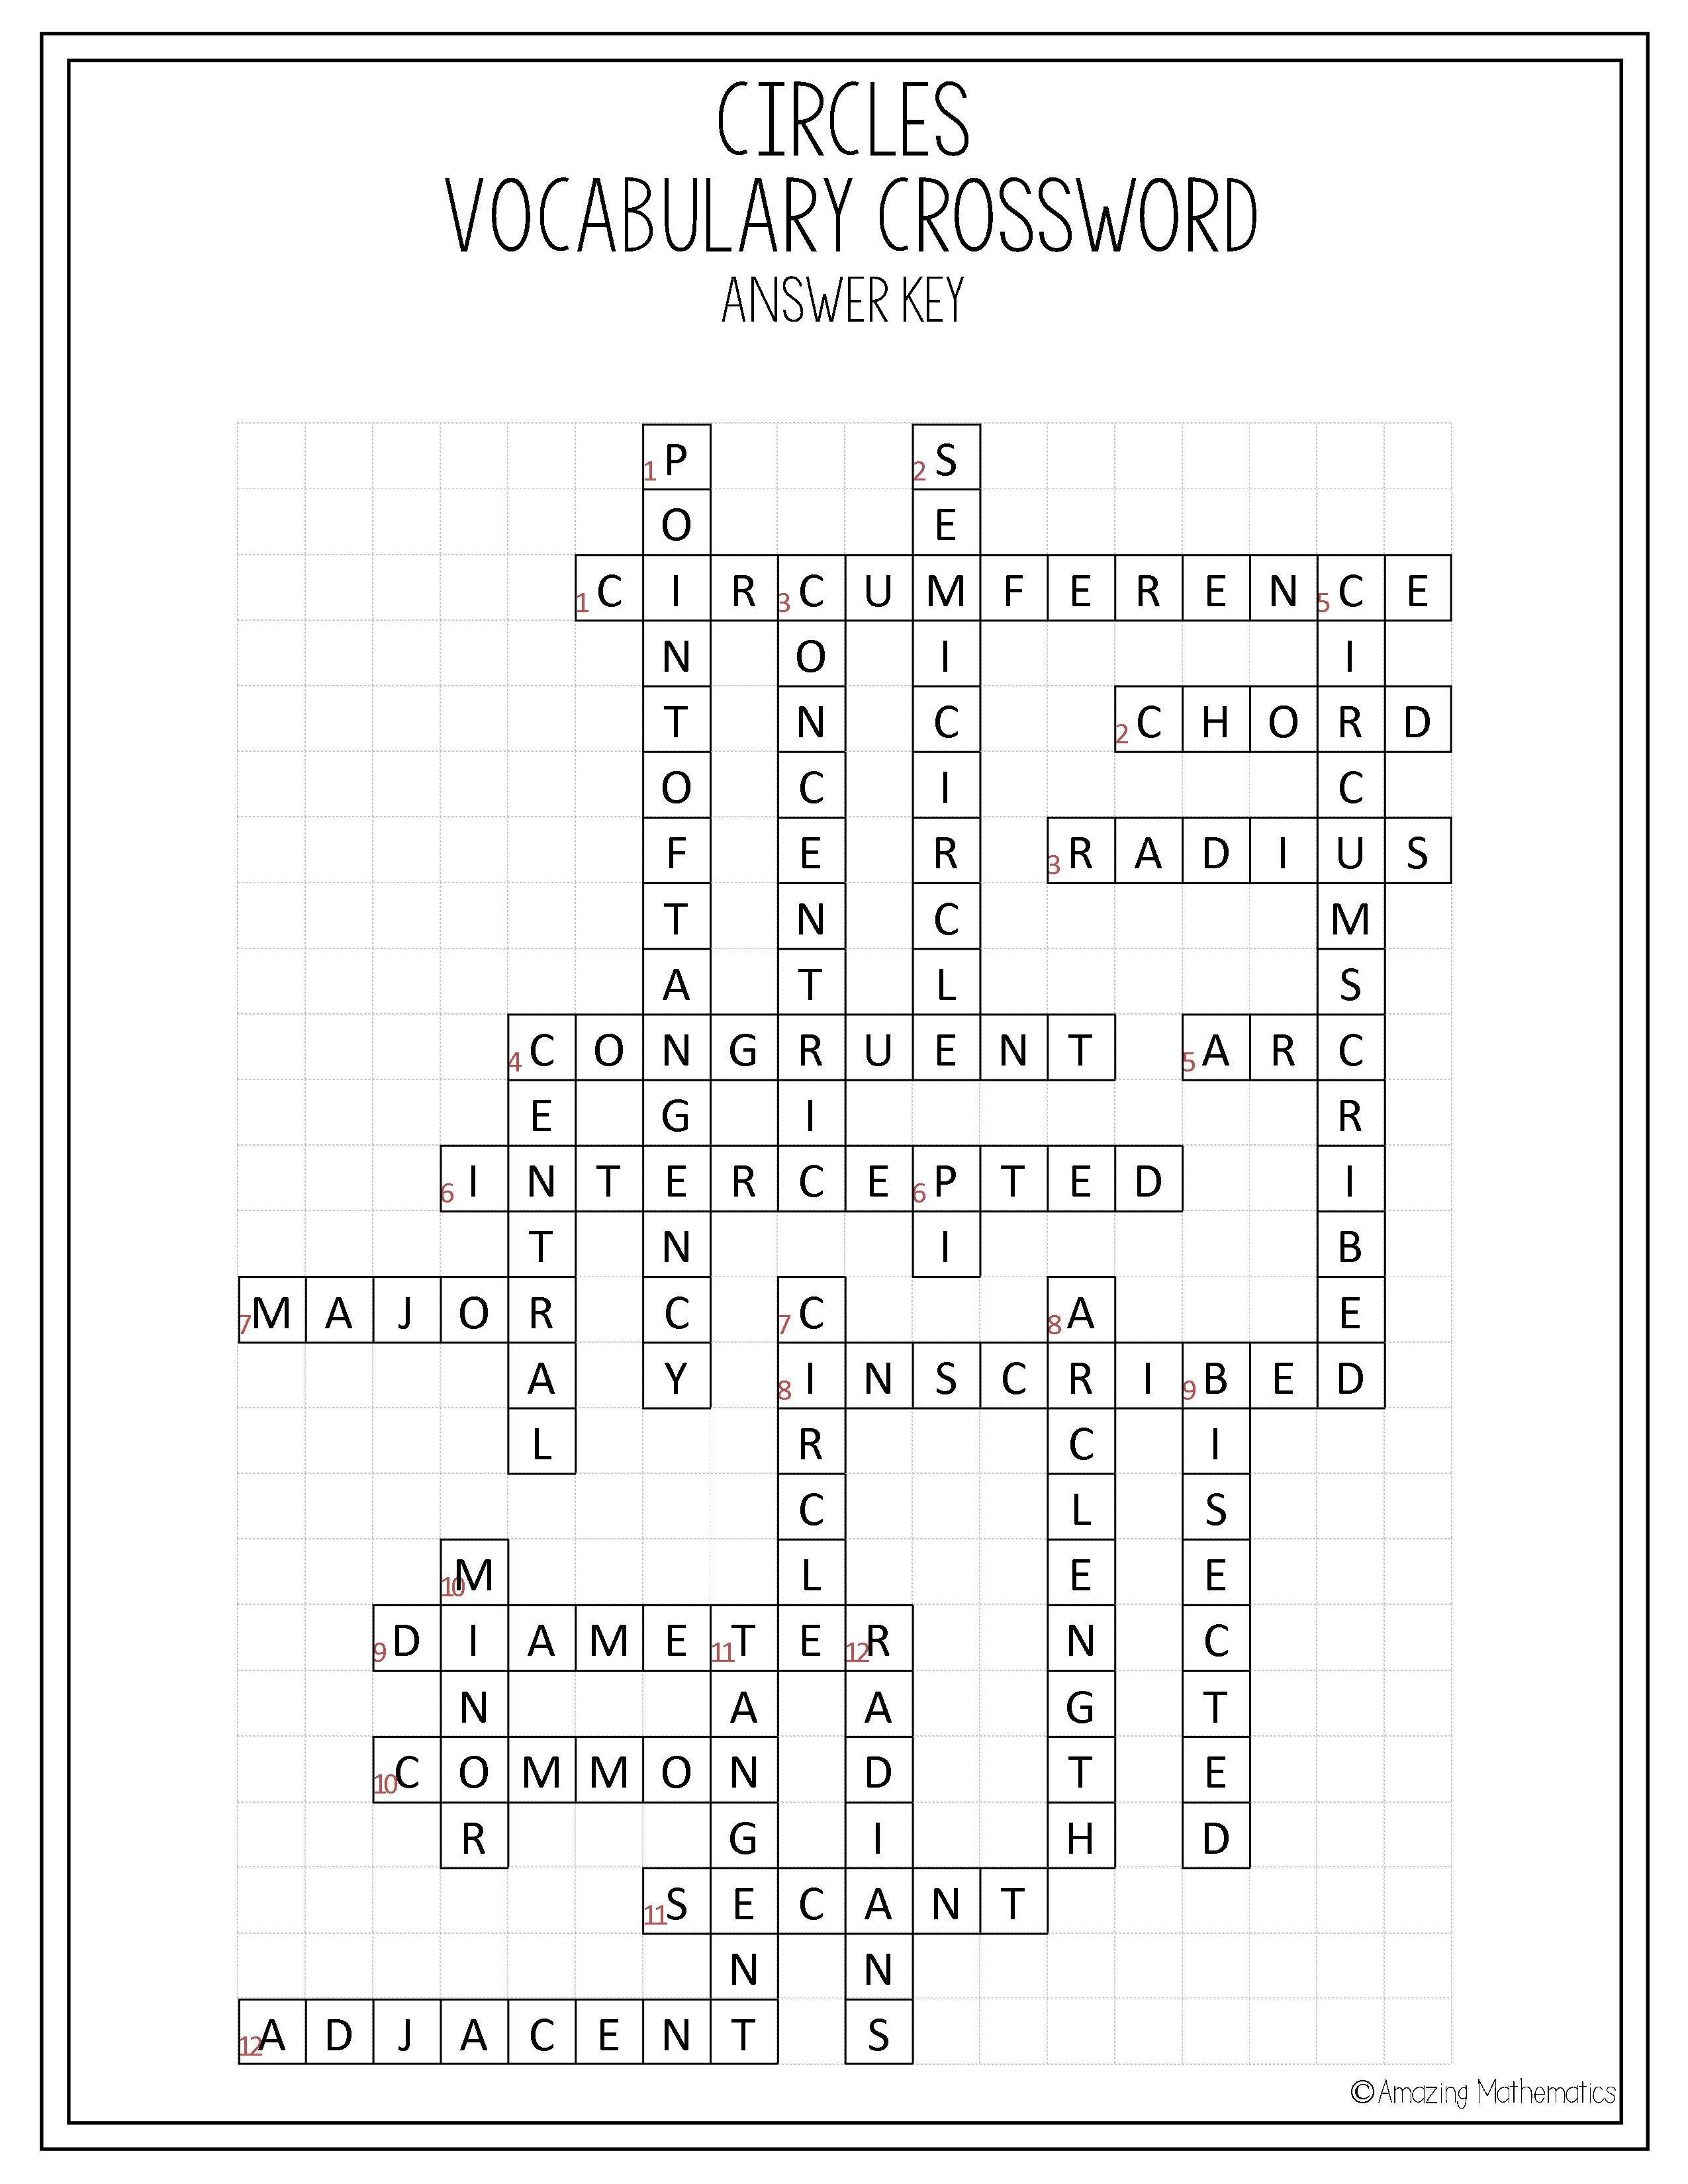 Circles Vocabulary Crossword | My Tpt Items | Geometry Worksheets - Geometry Vocabulary Crossword Puzzle Printable